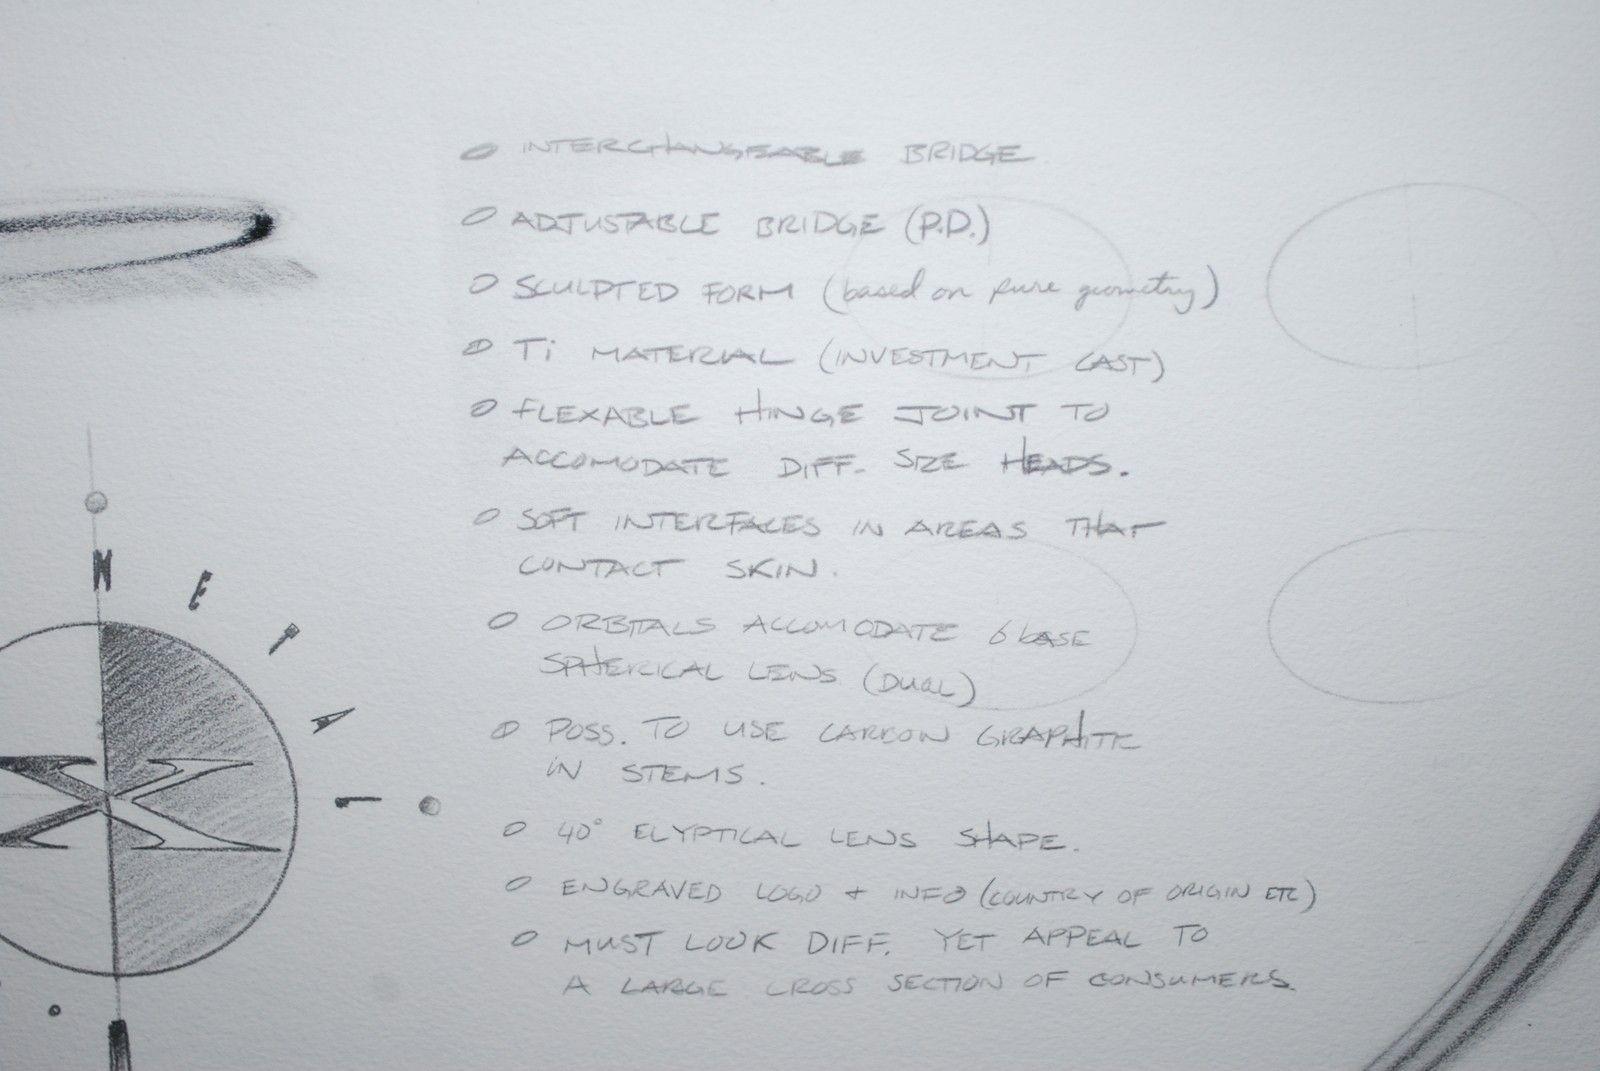 Oakley Giclee Romeo sketch/lithograph - DSC_0294.JPG